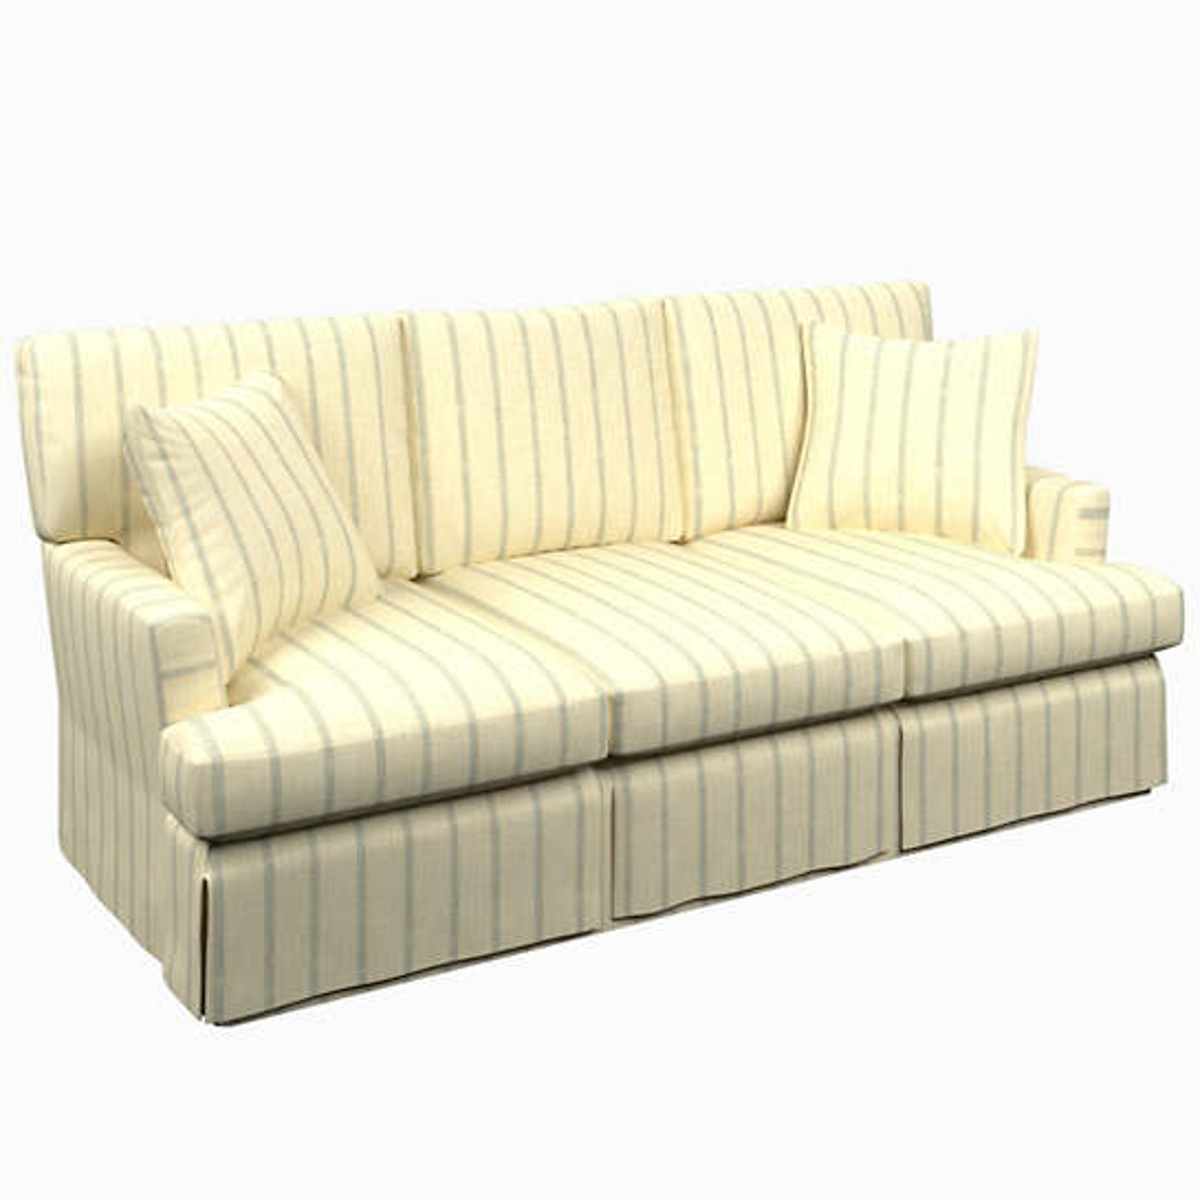 Glendale Stripe Light Blue/Natural Saybrook 3 Seater Upholstered Sofa